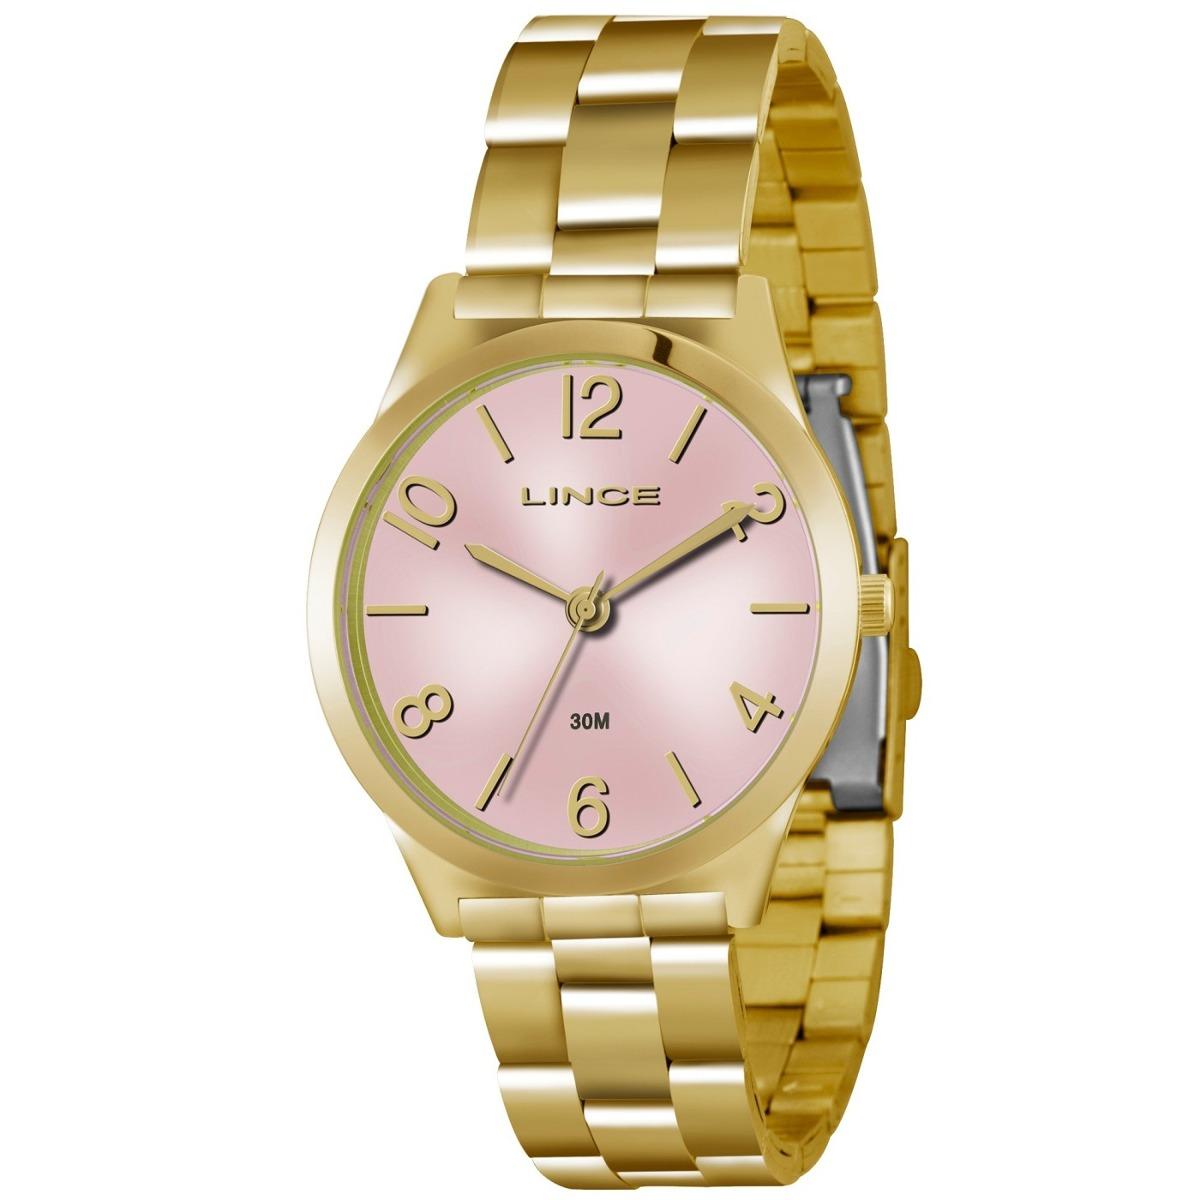 f20b8d65f7f Relógio Lince Feminino Dourado Fundo Rosa Lrg4301l R2kx - R  174